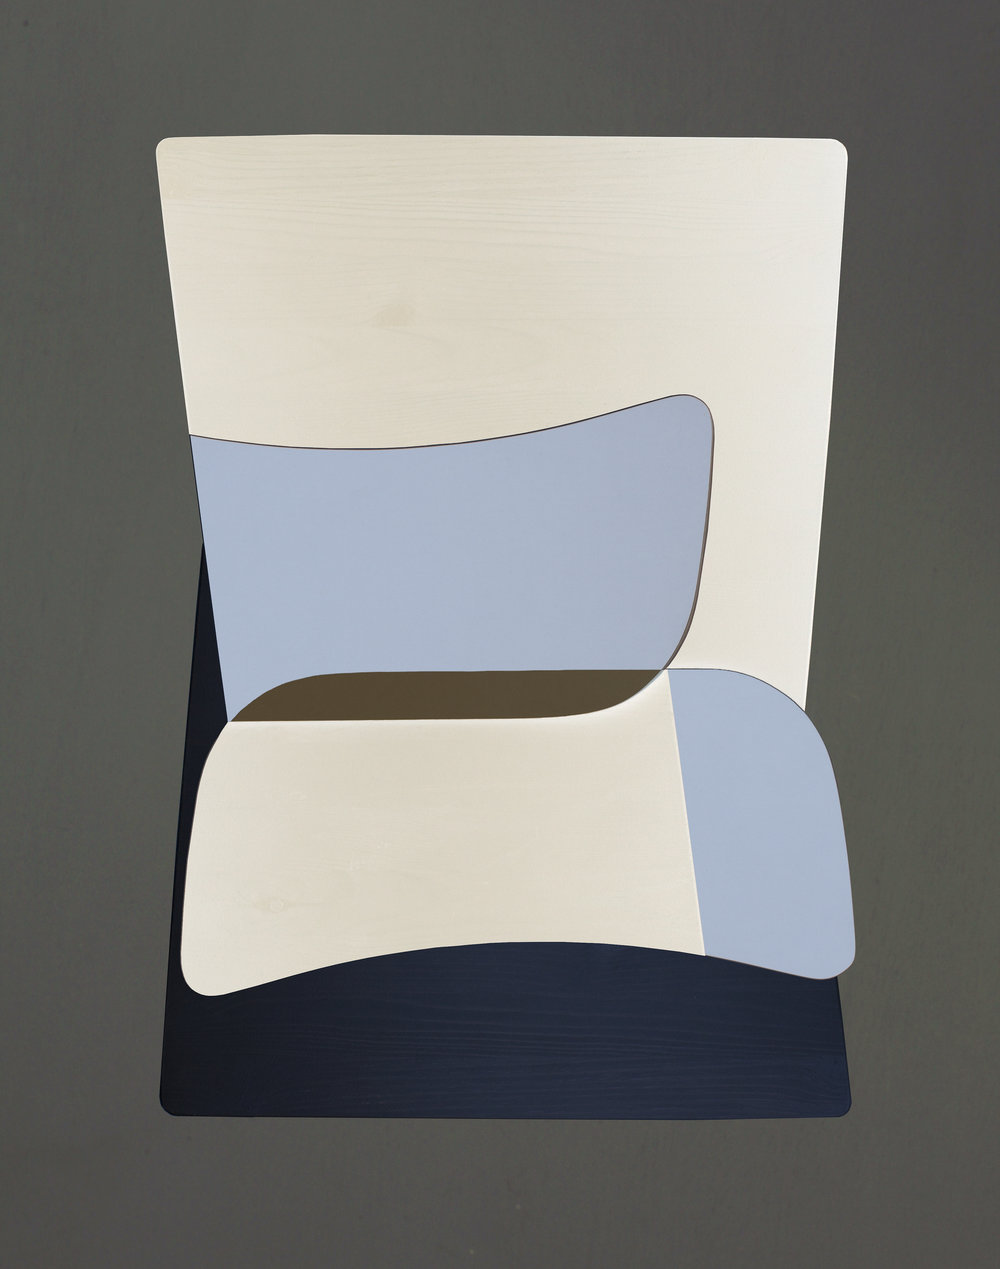 Denis Darzacq,  Contreformes No. 4 , 2017  Digital pigment print, 100 X 78.79 cm (39.37 × 31 in), edition of 5   Inquire